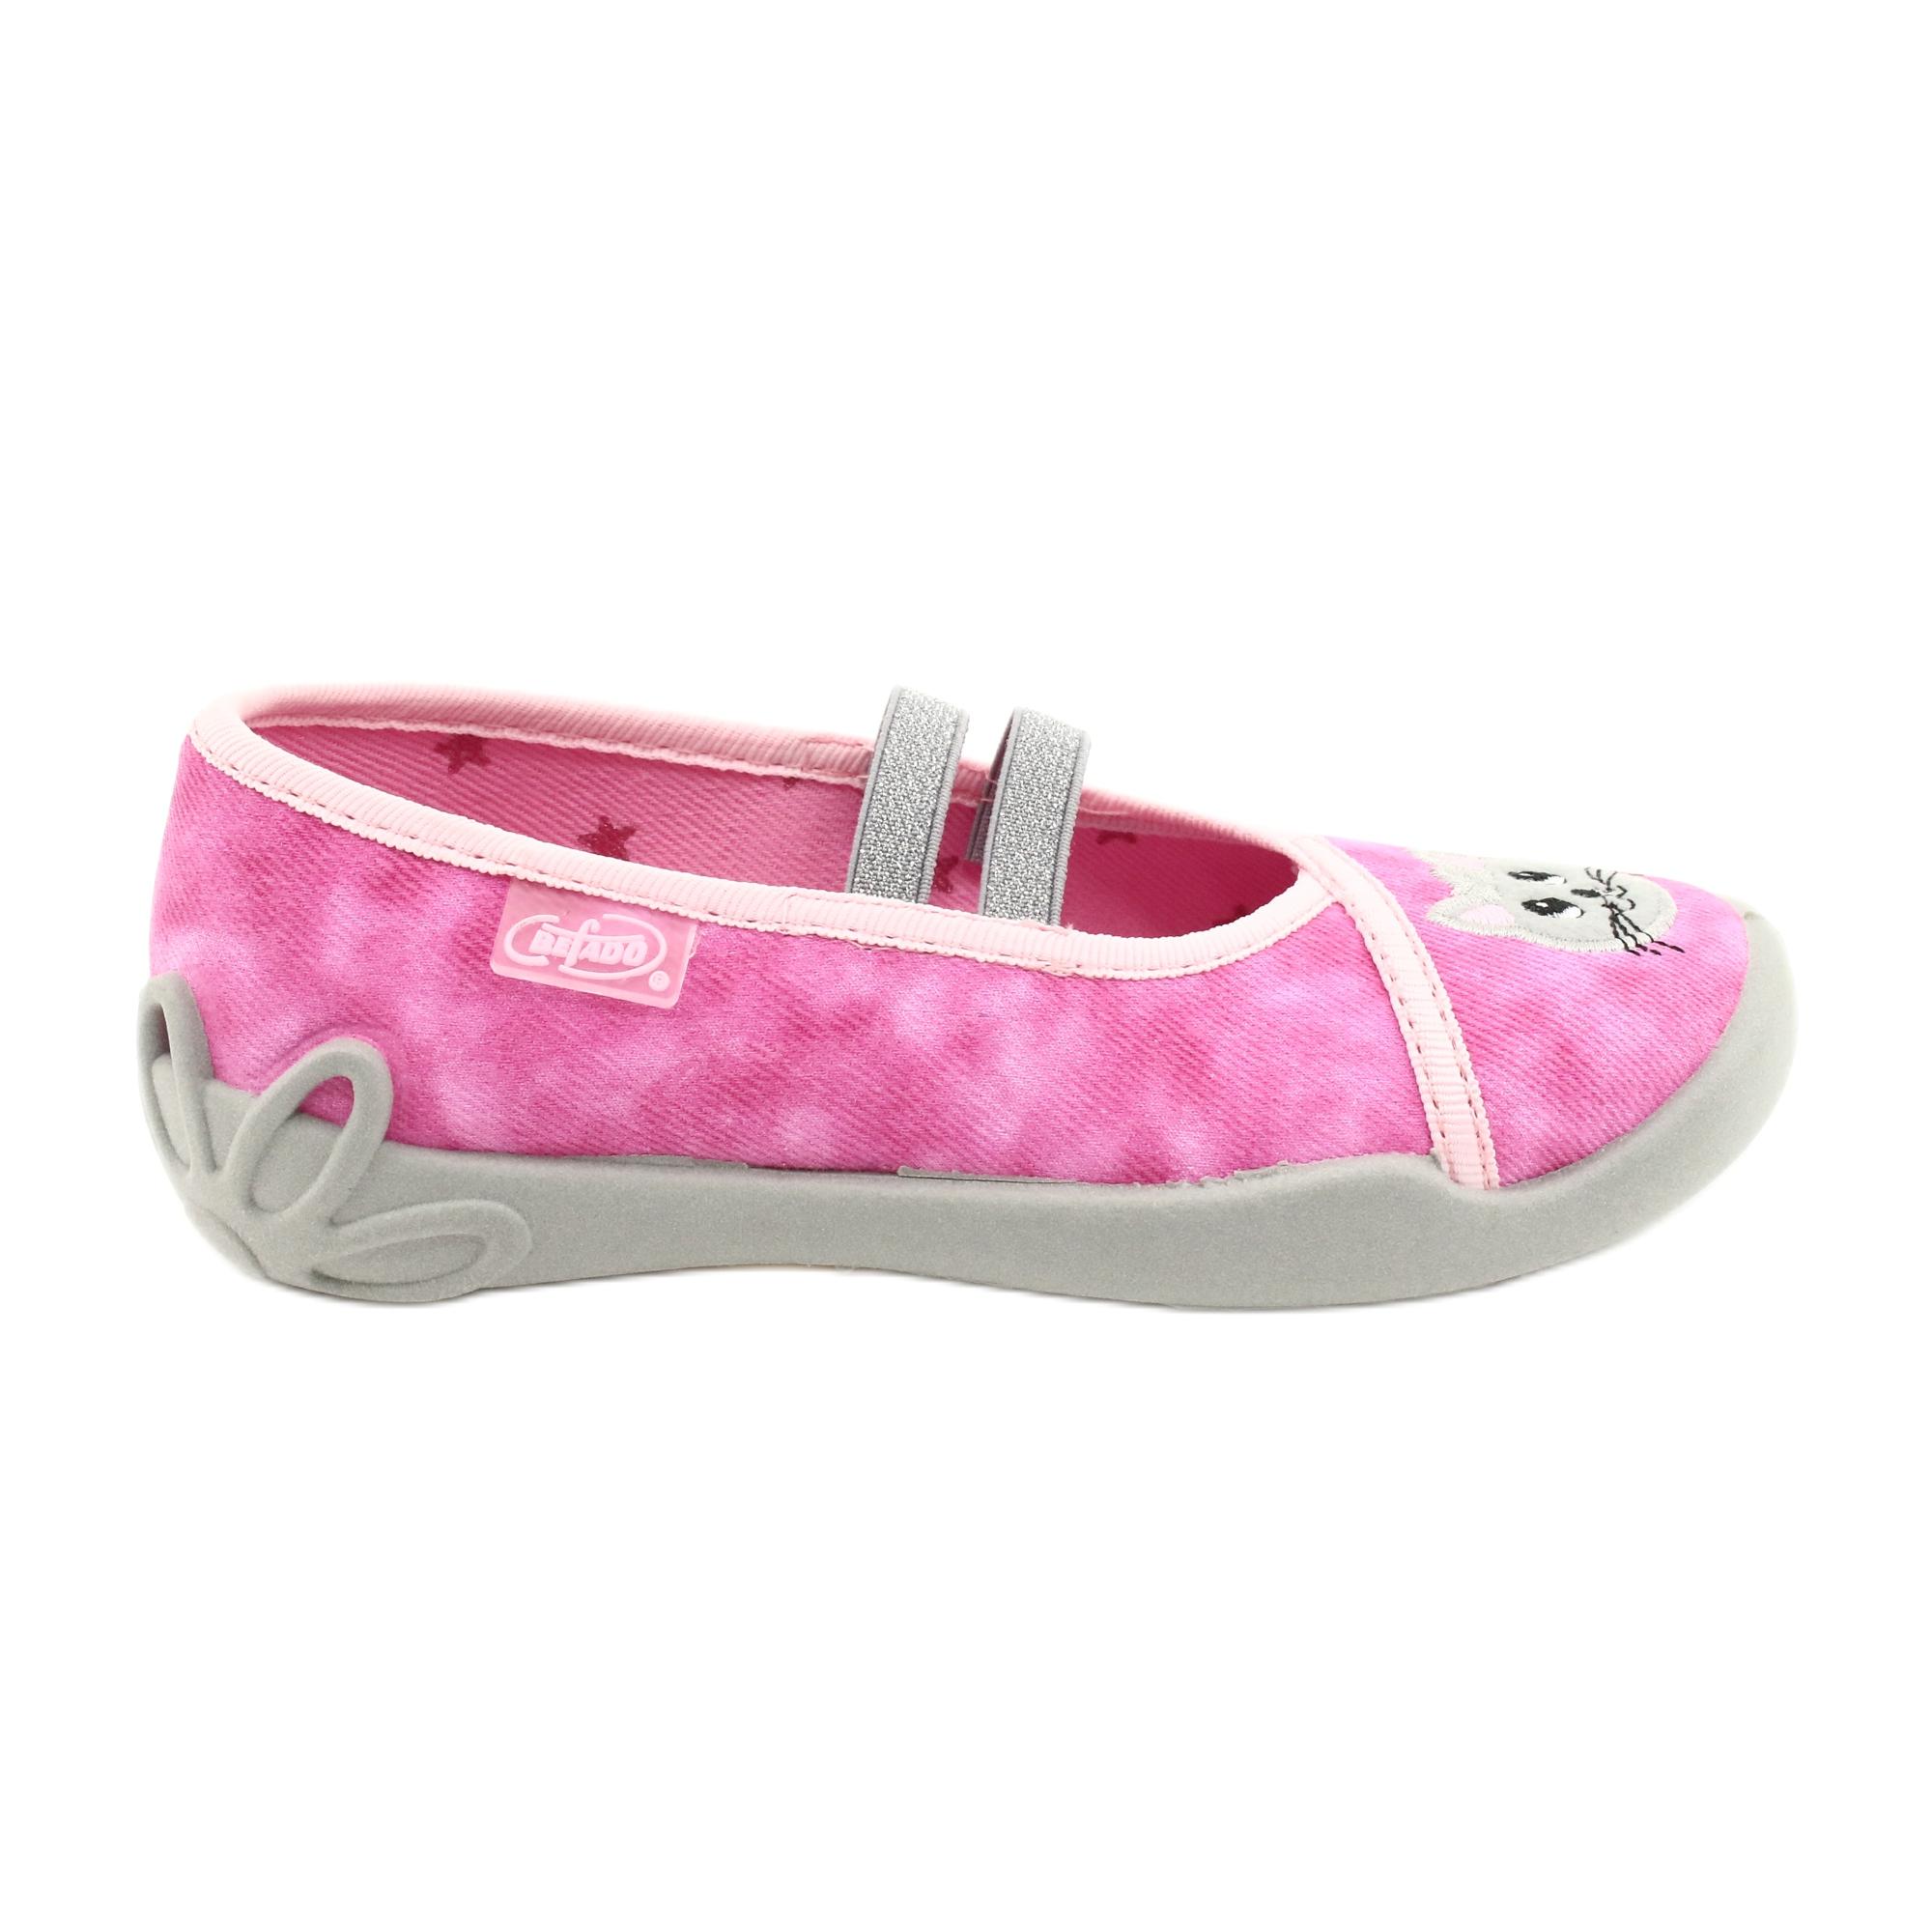 Scarpe per bambini Befado 116X290 rosa argento grigio